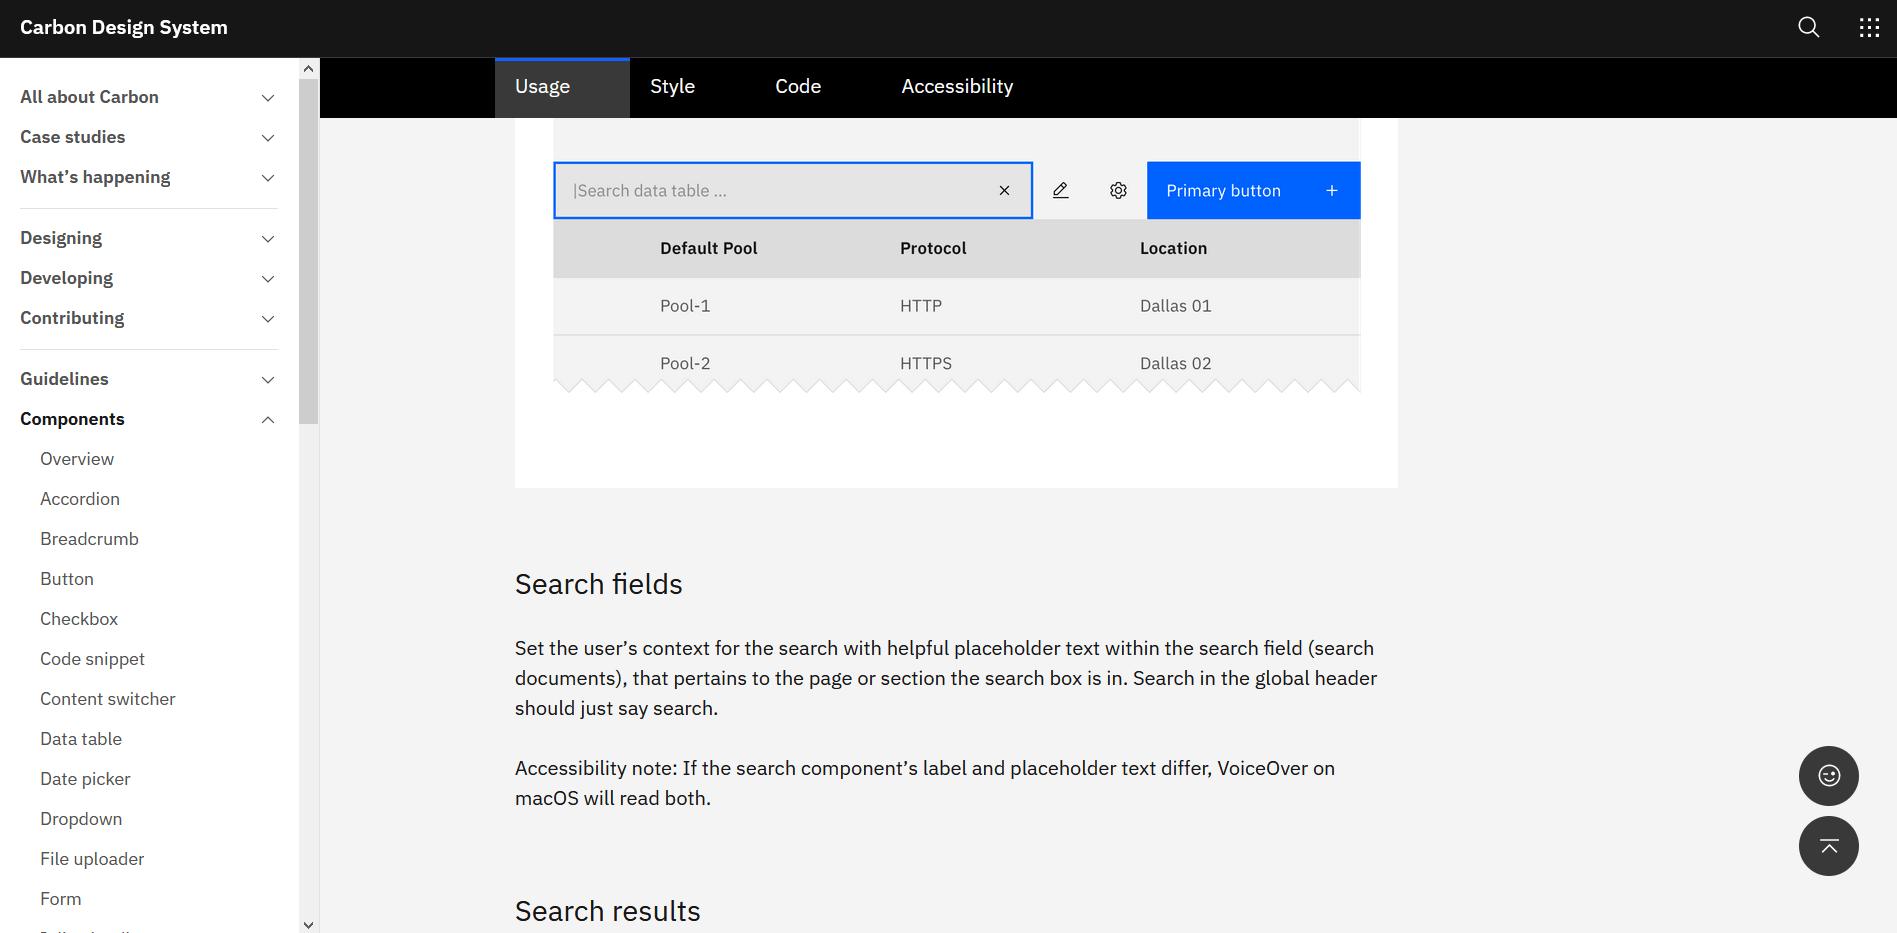 IBM Carbon Design System search bar